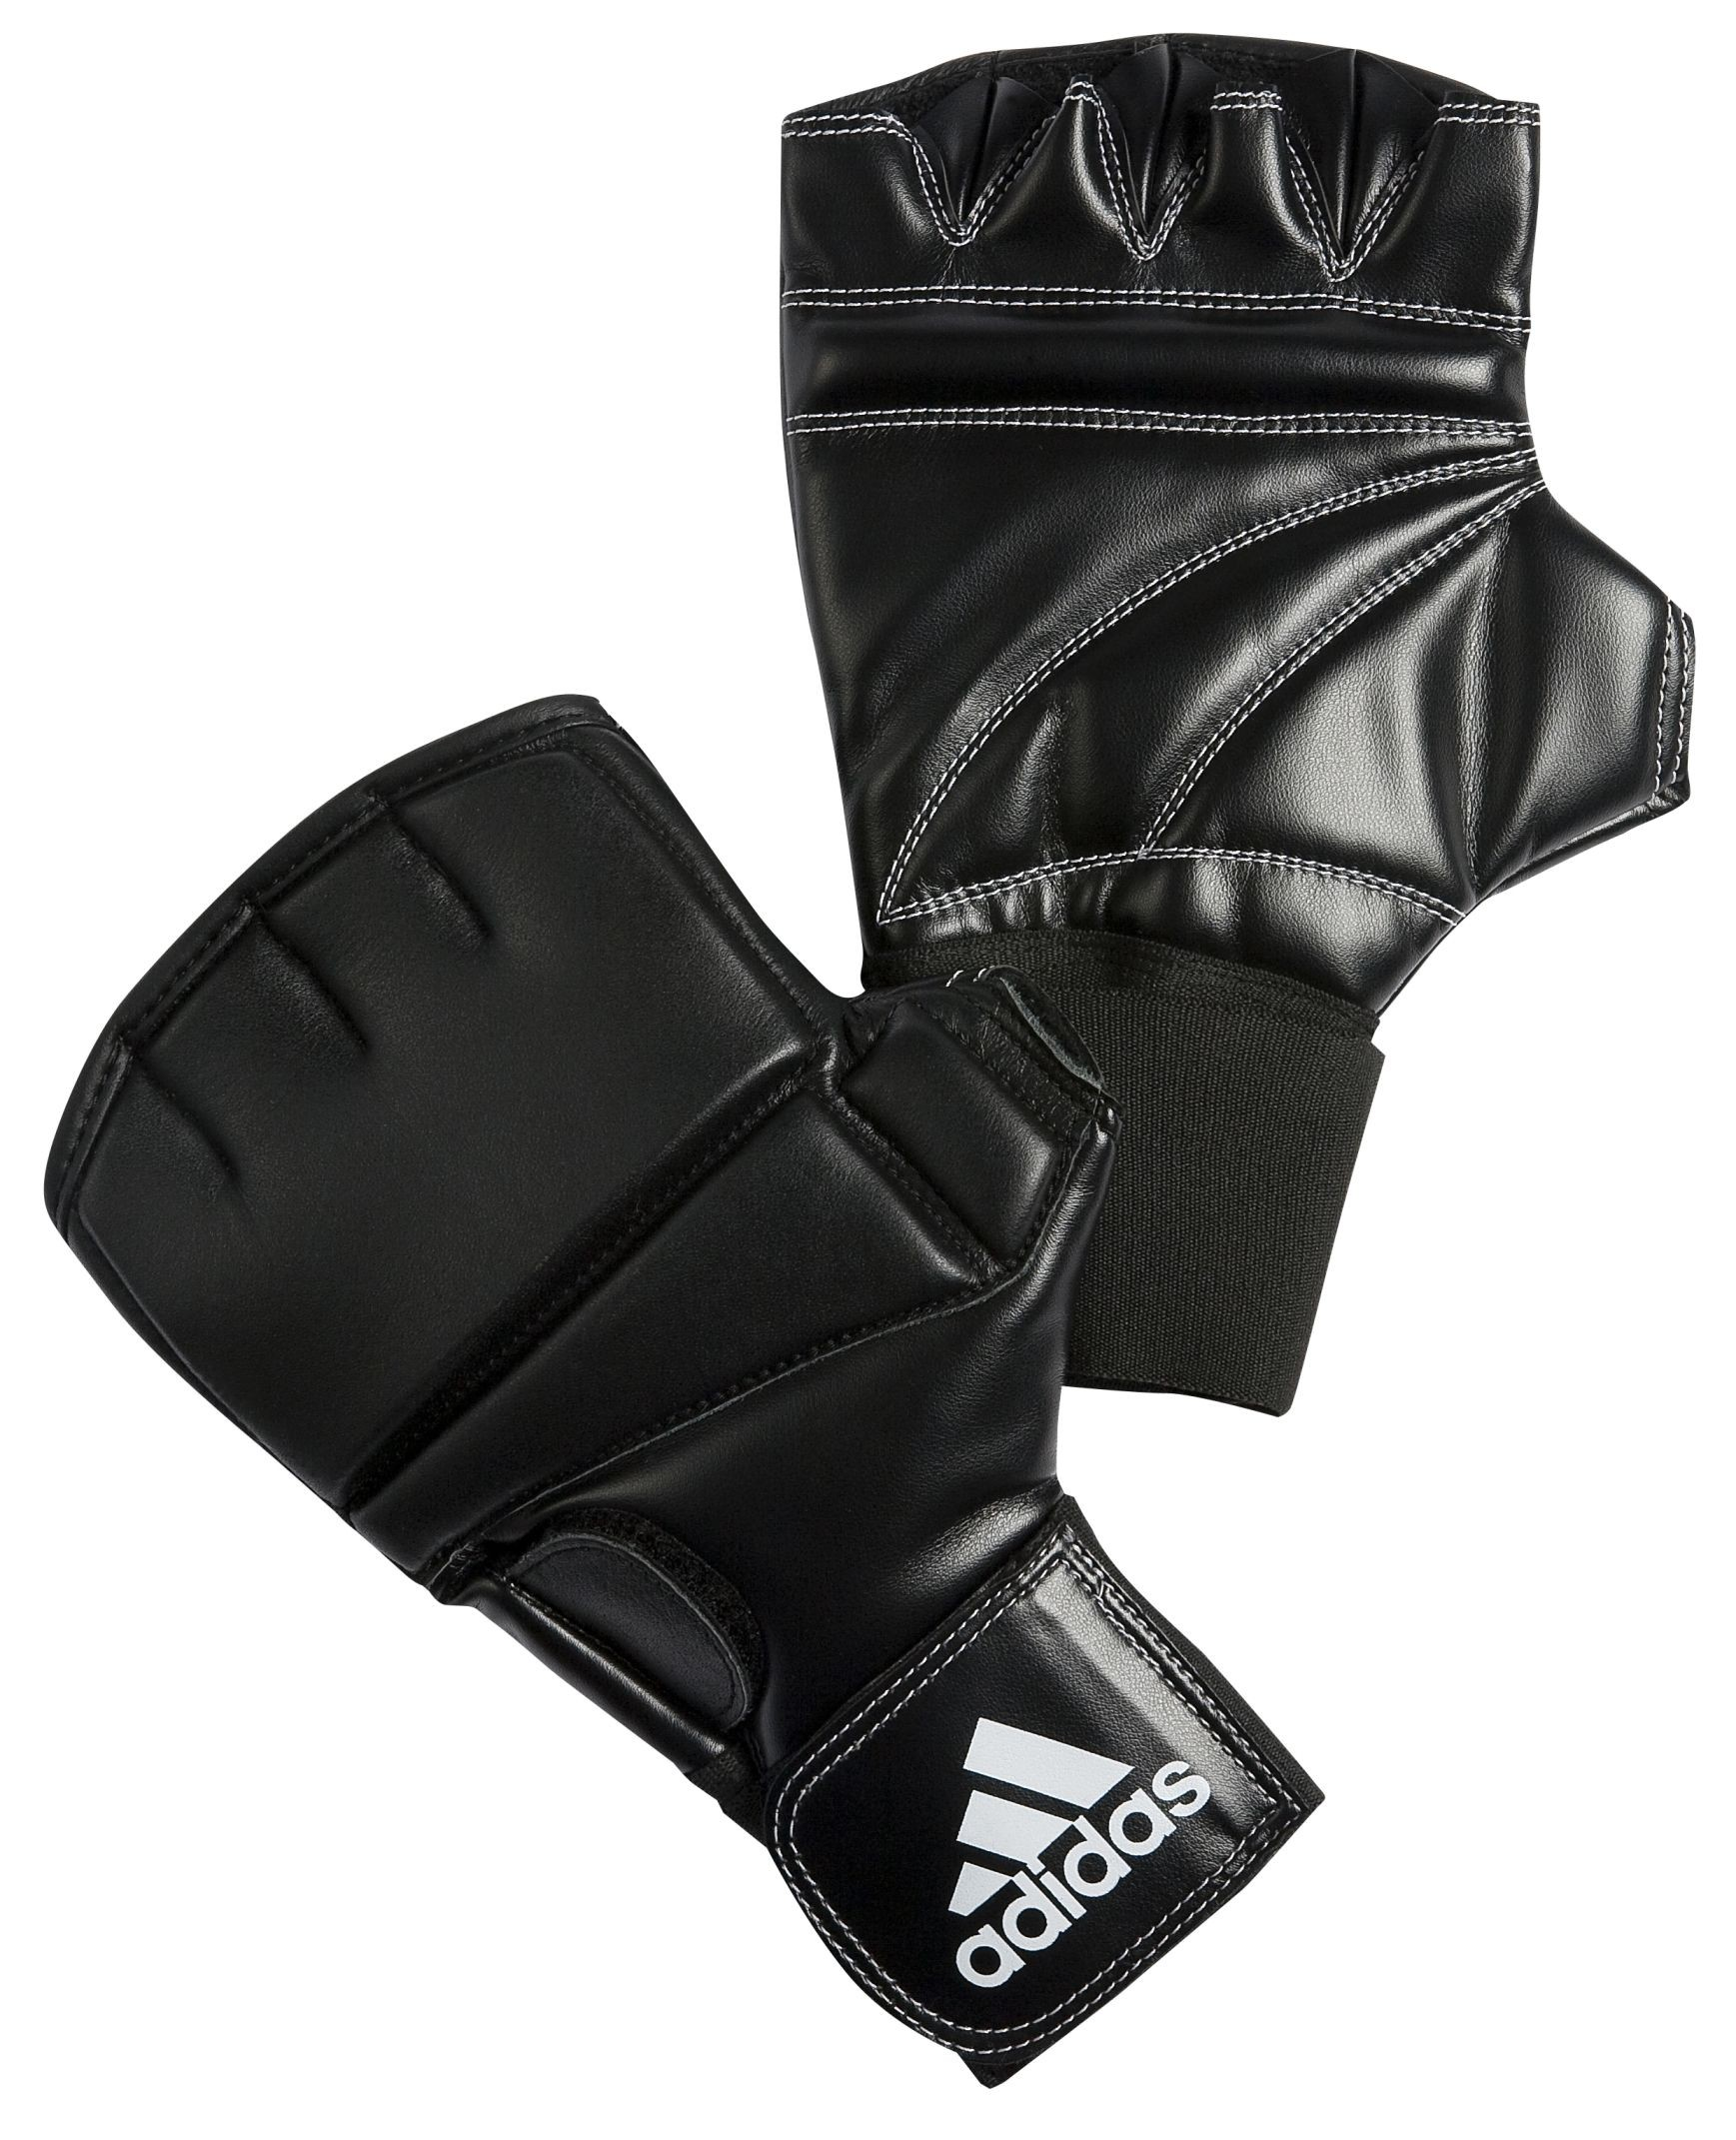 Adidas Sandsackhandschuh